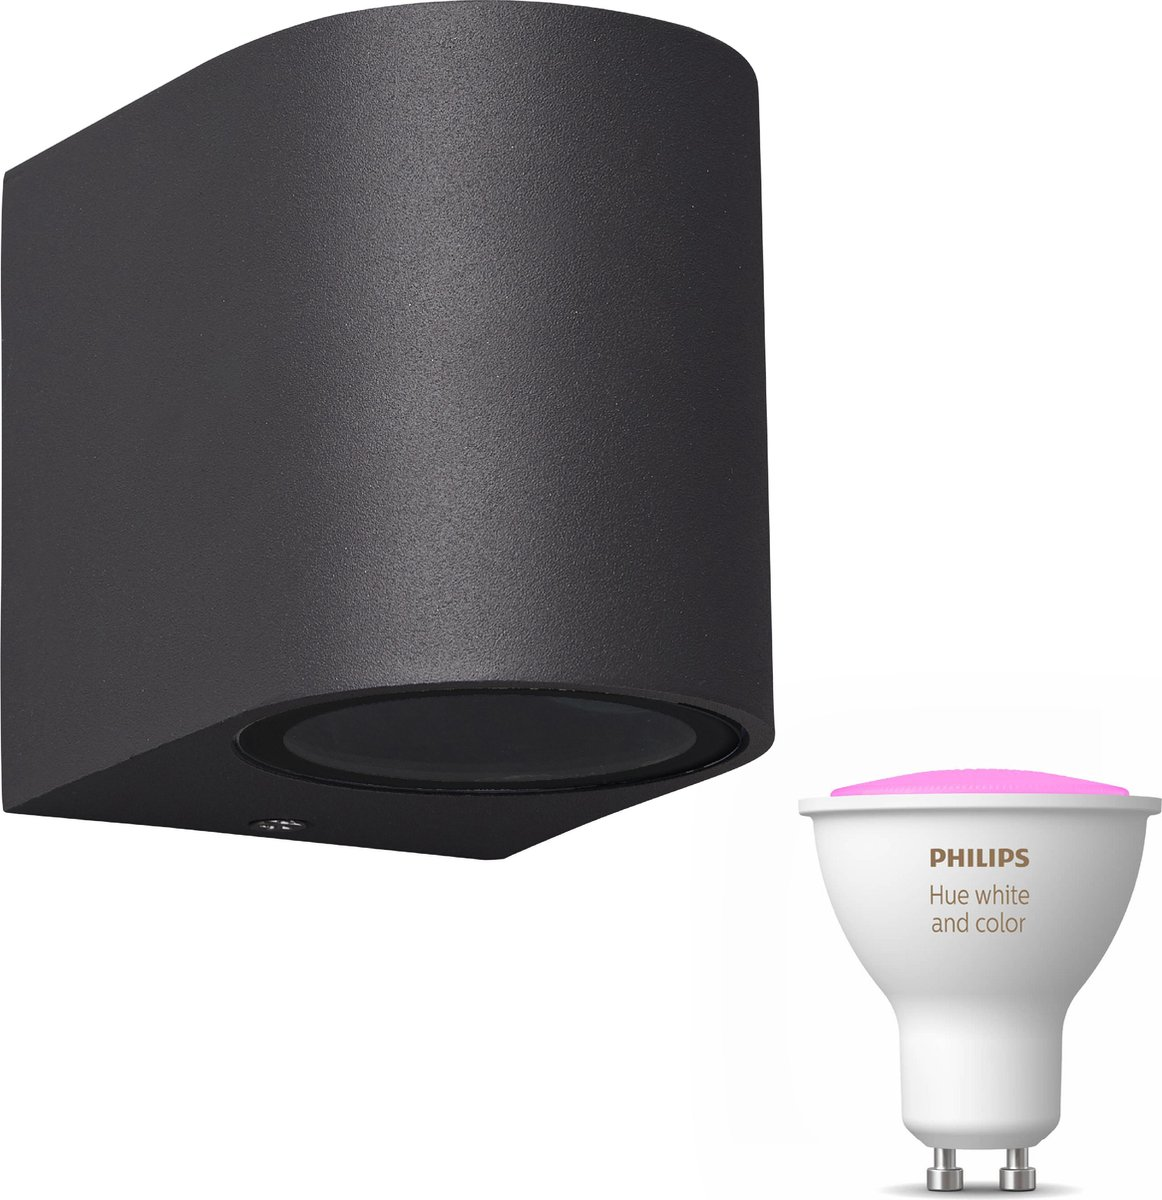 Mantra Kandachu wandlamp rond - antraciet - 1 lichtpunt - Incl. Philips Hue White & Color Ambiance Gu10 (geschikt voor buitengebruik)